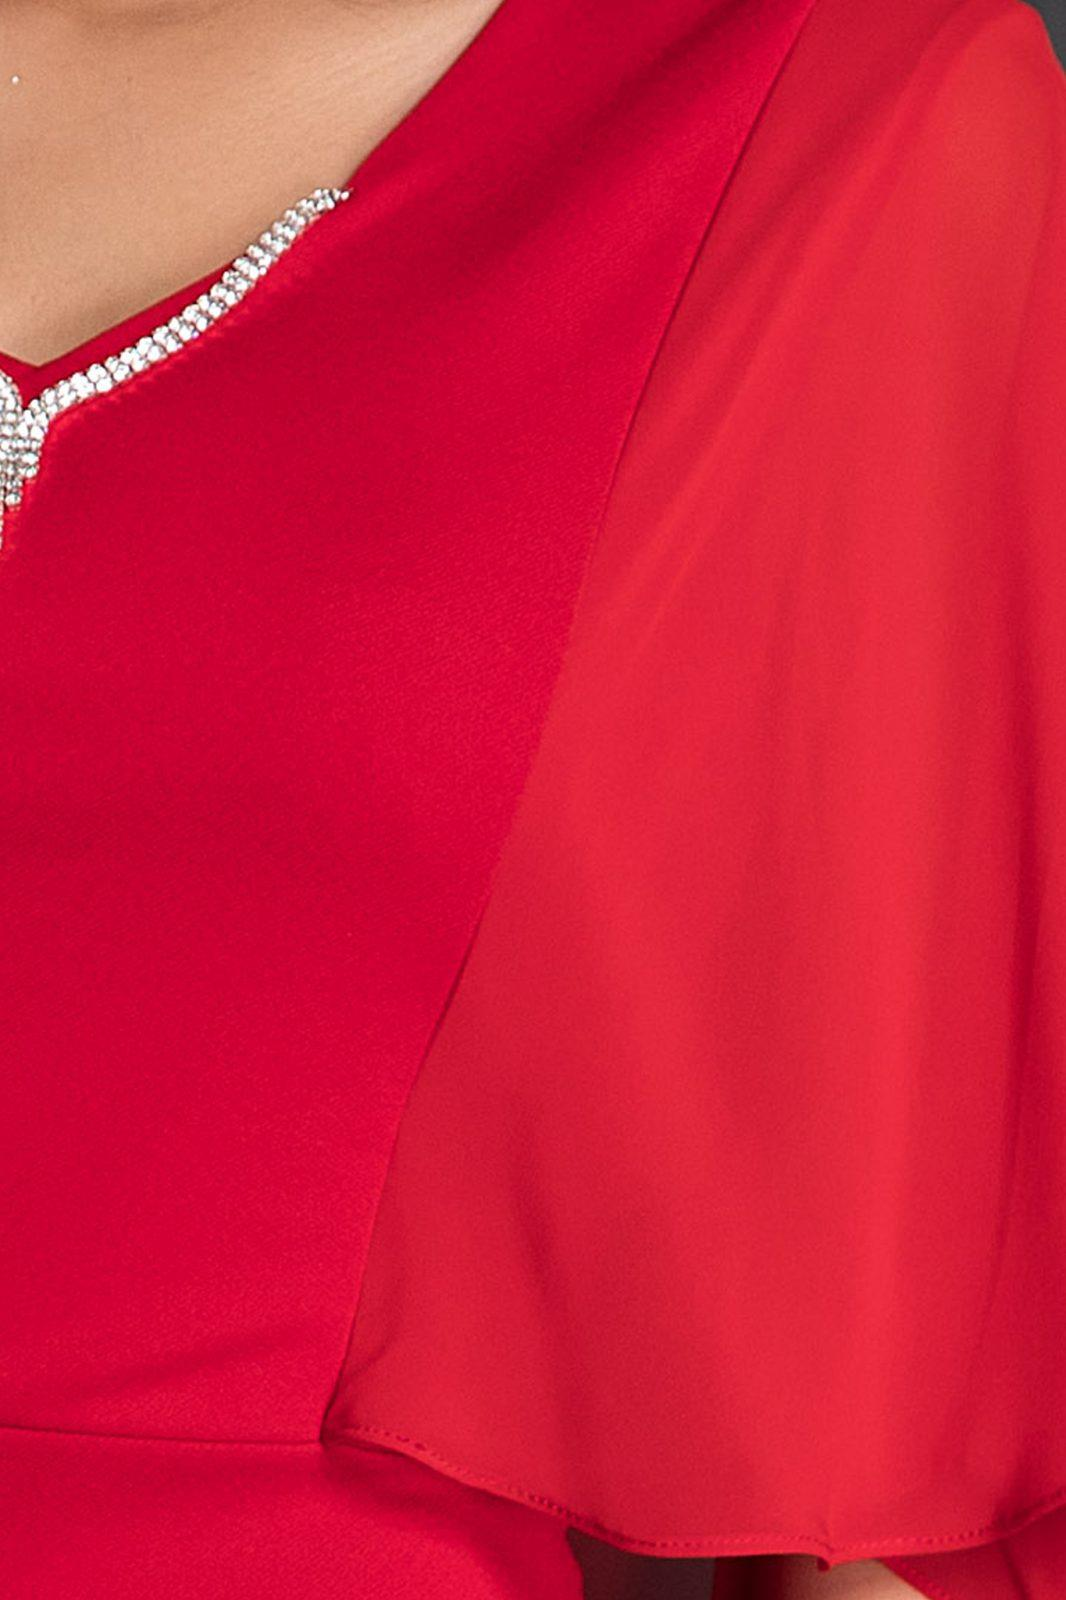 Hilary Κόκκινο Φόρεμα 2248